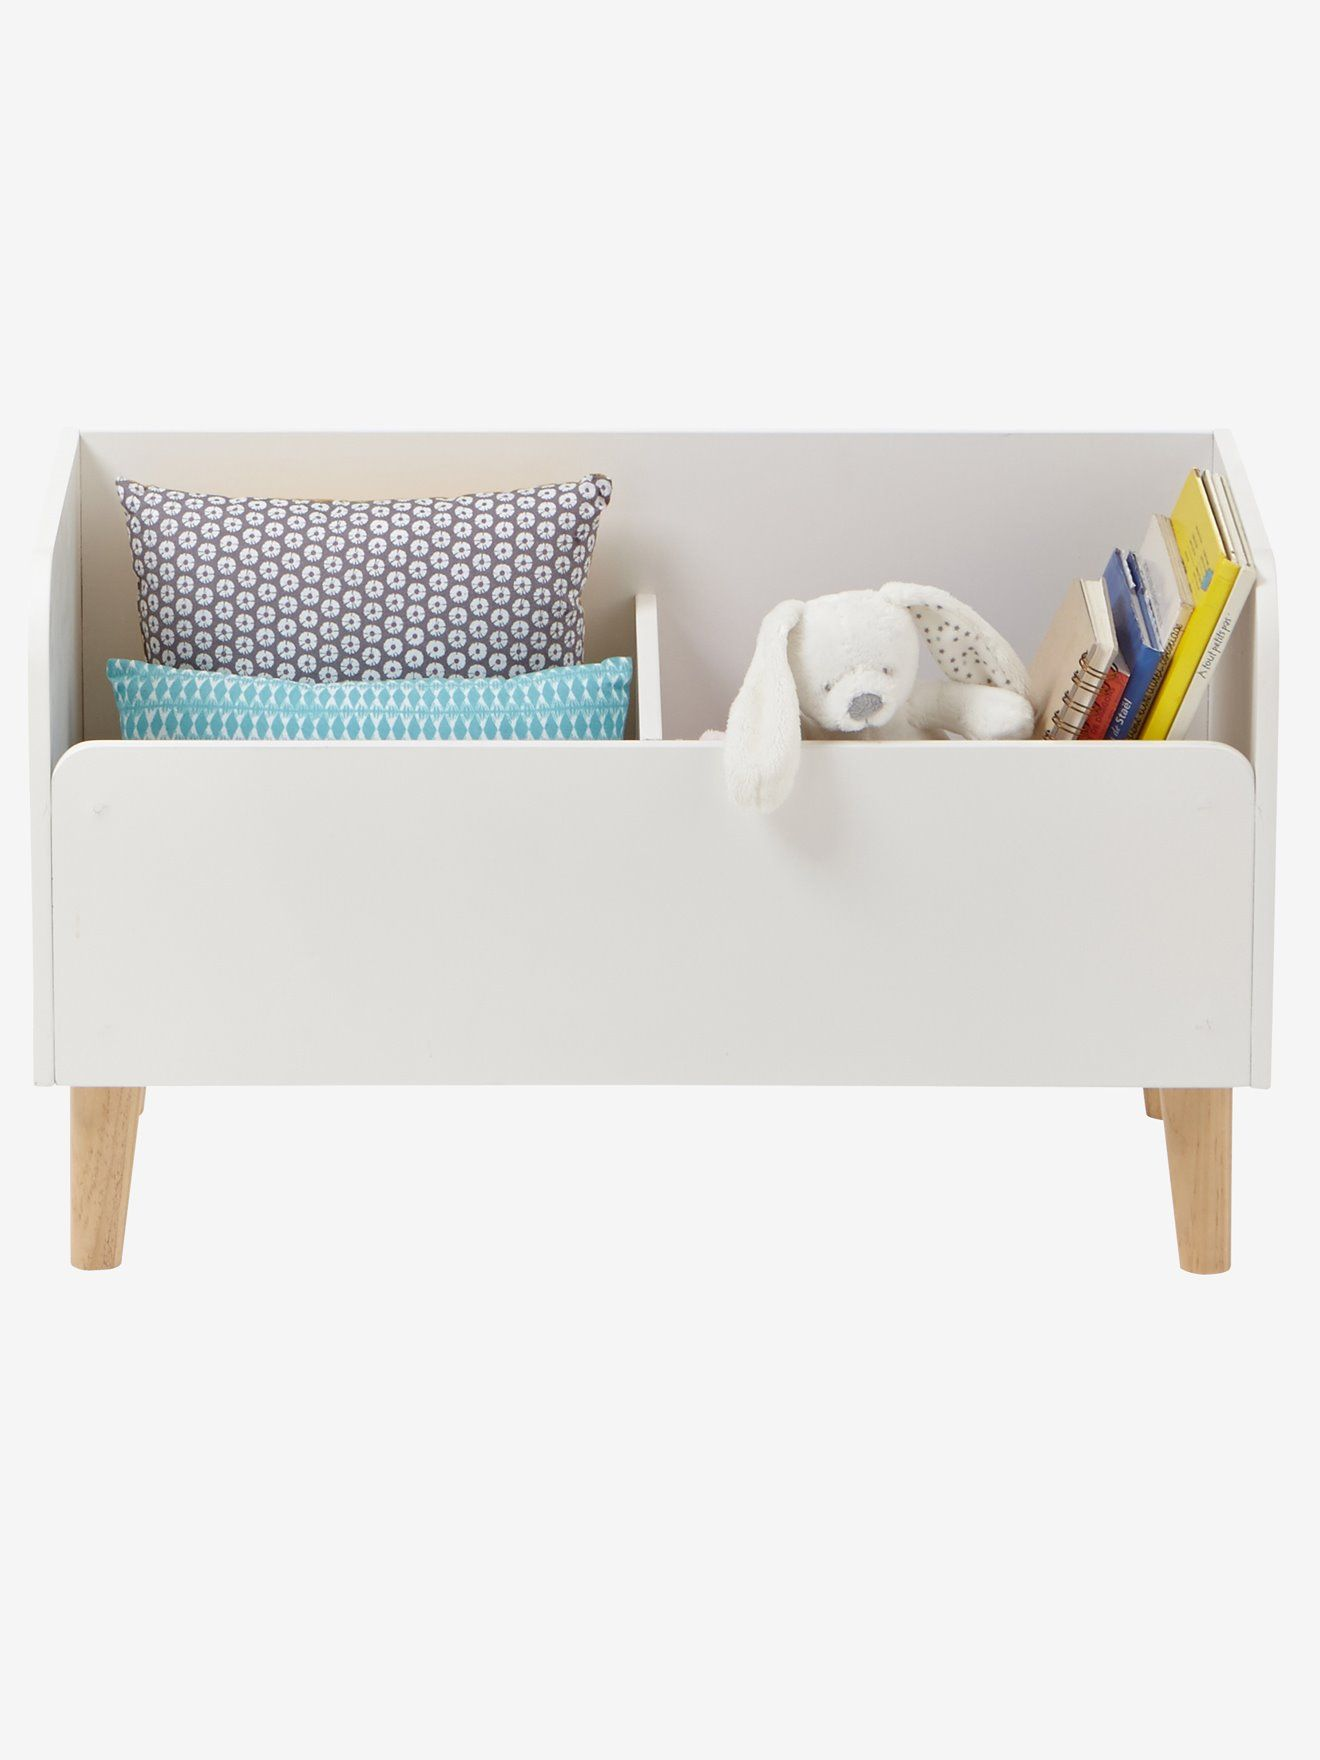 Book Chest Confetti Theme White Wood Bedroom Furniture